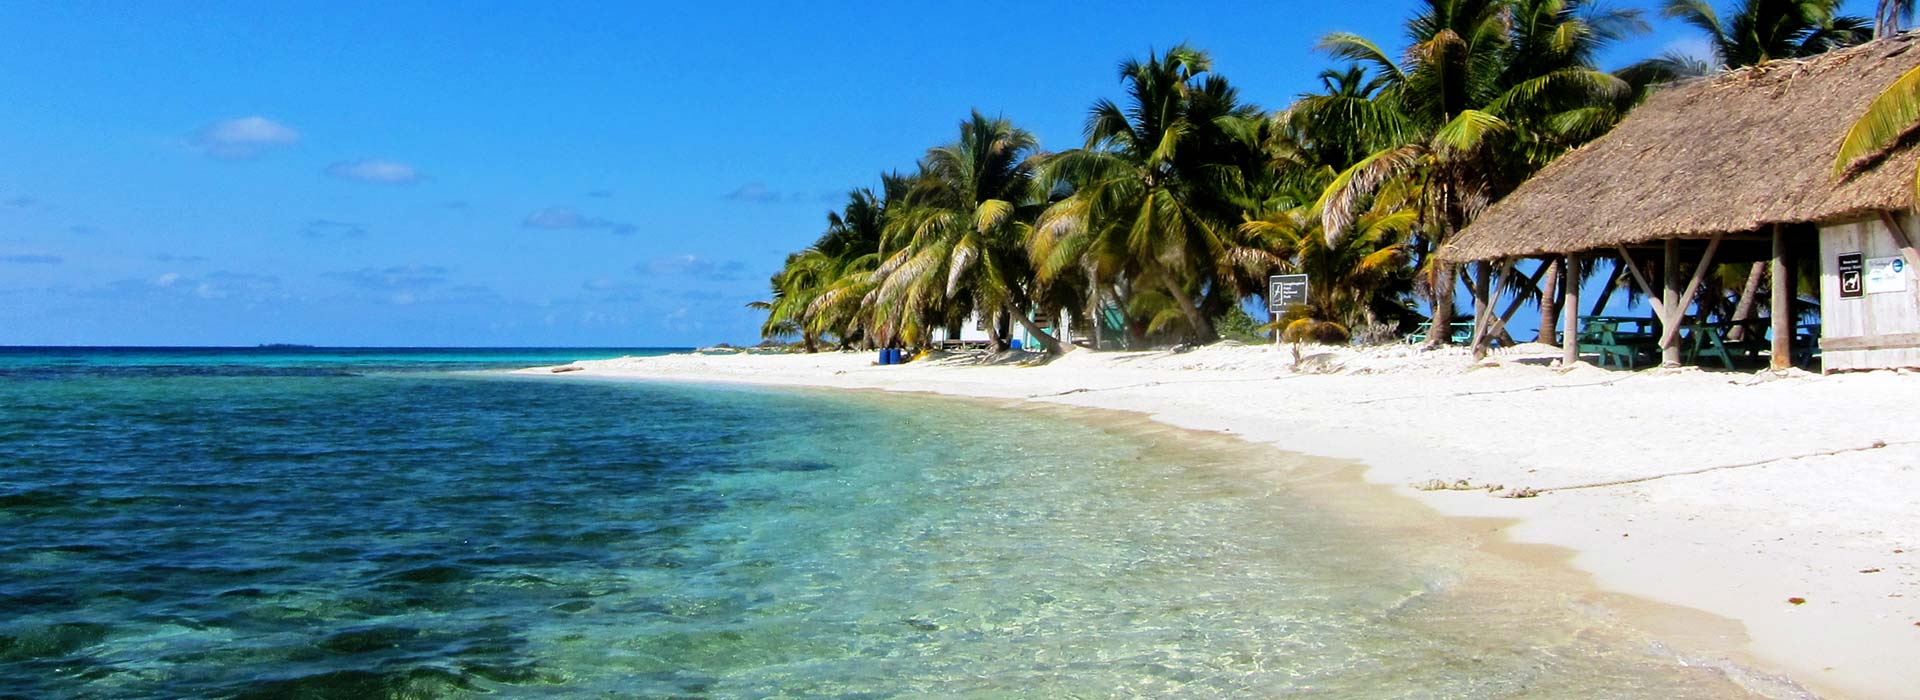 Belize natural beauty